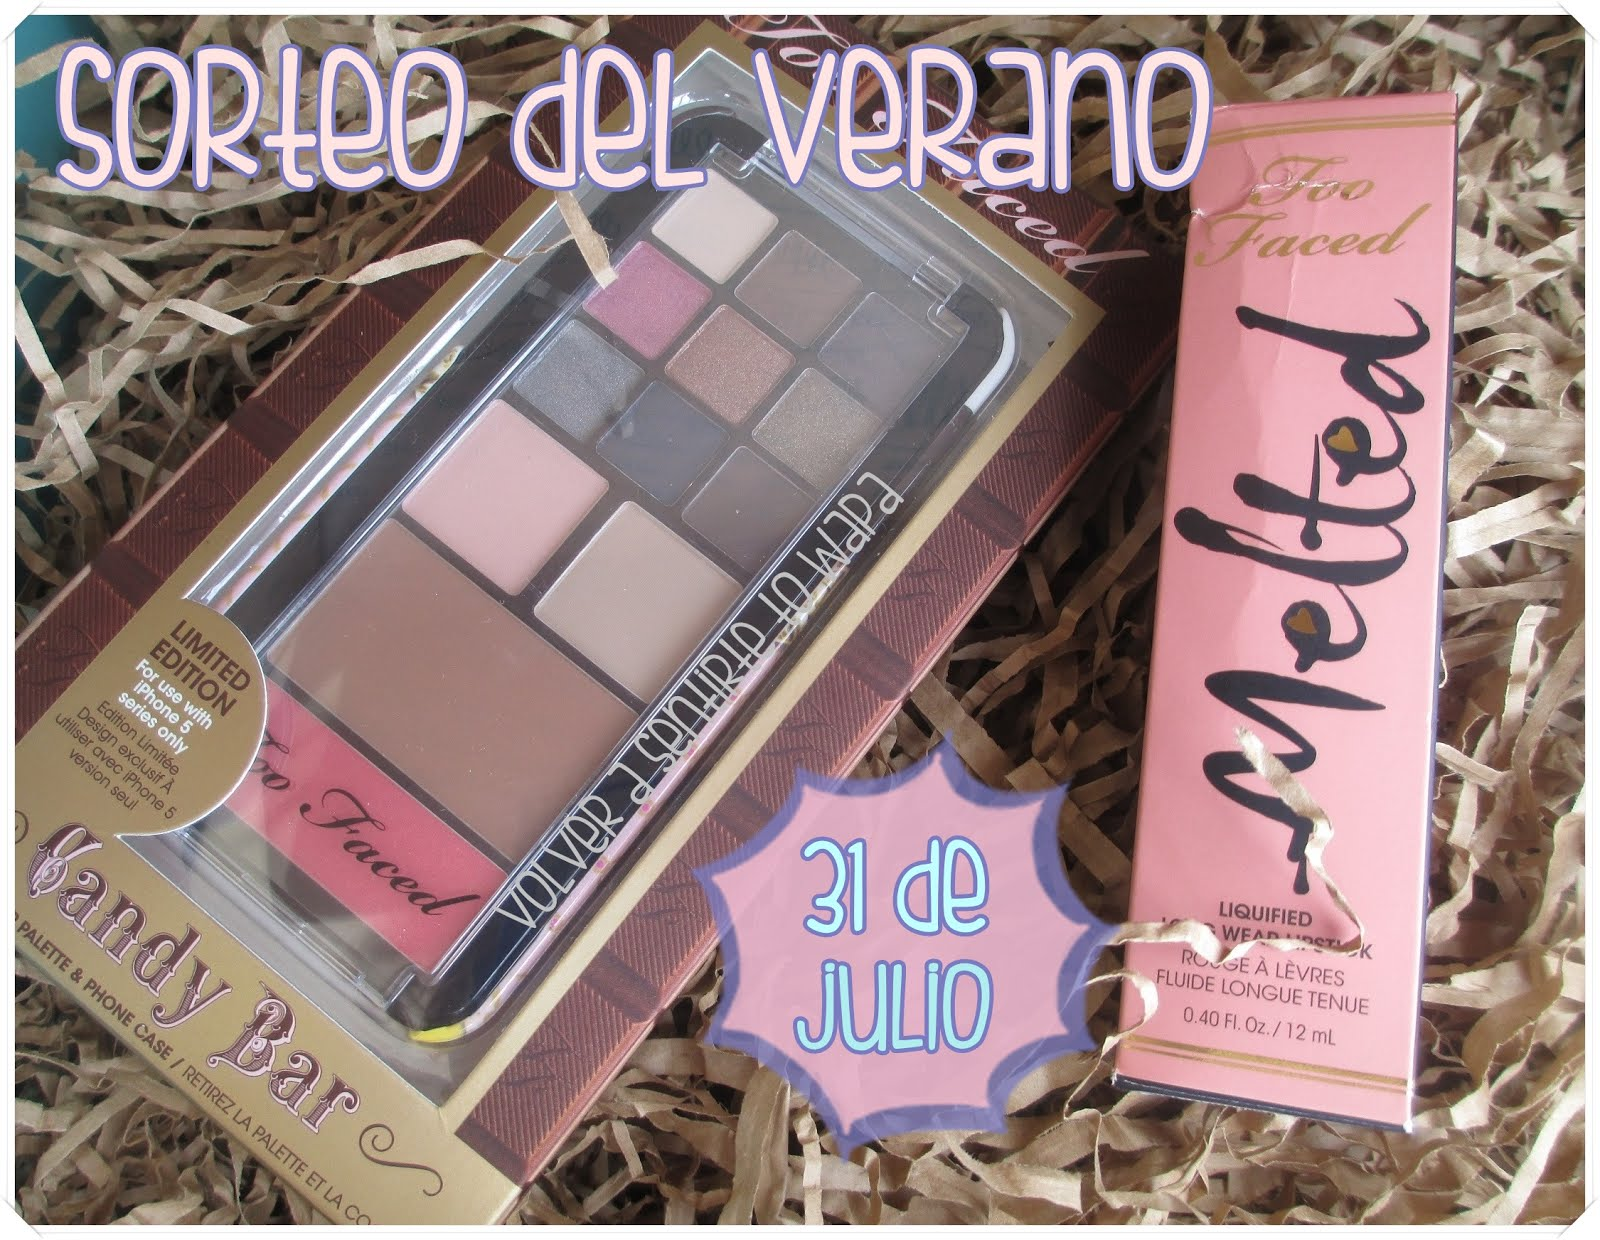 http://www.volverasentirtetowapa.com/2014/07/sorteo-del-verano-2-productos-de-too.html